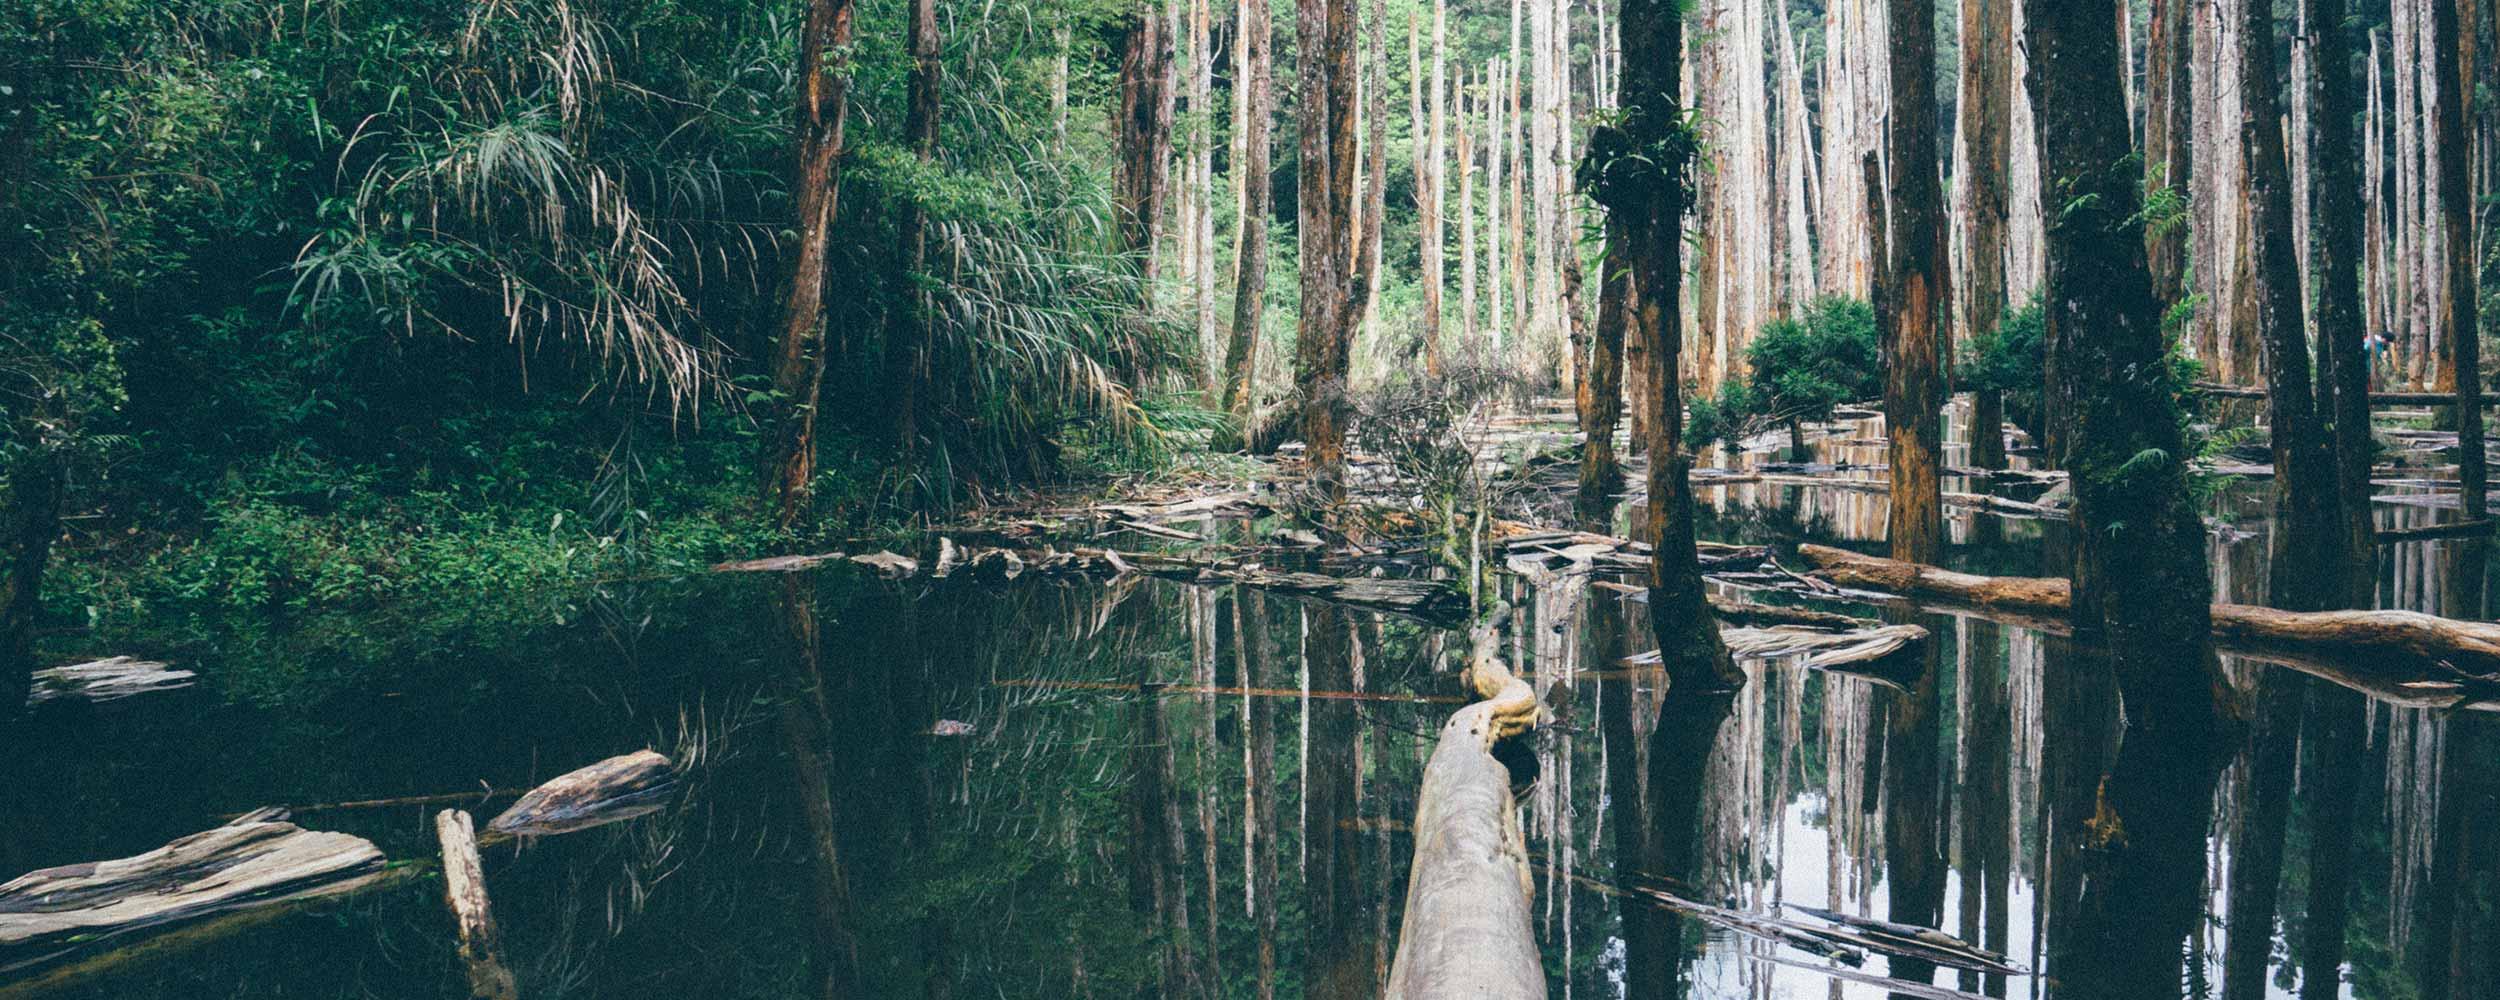 - Wetland Delineation